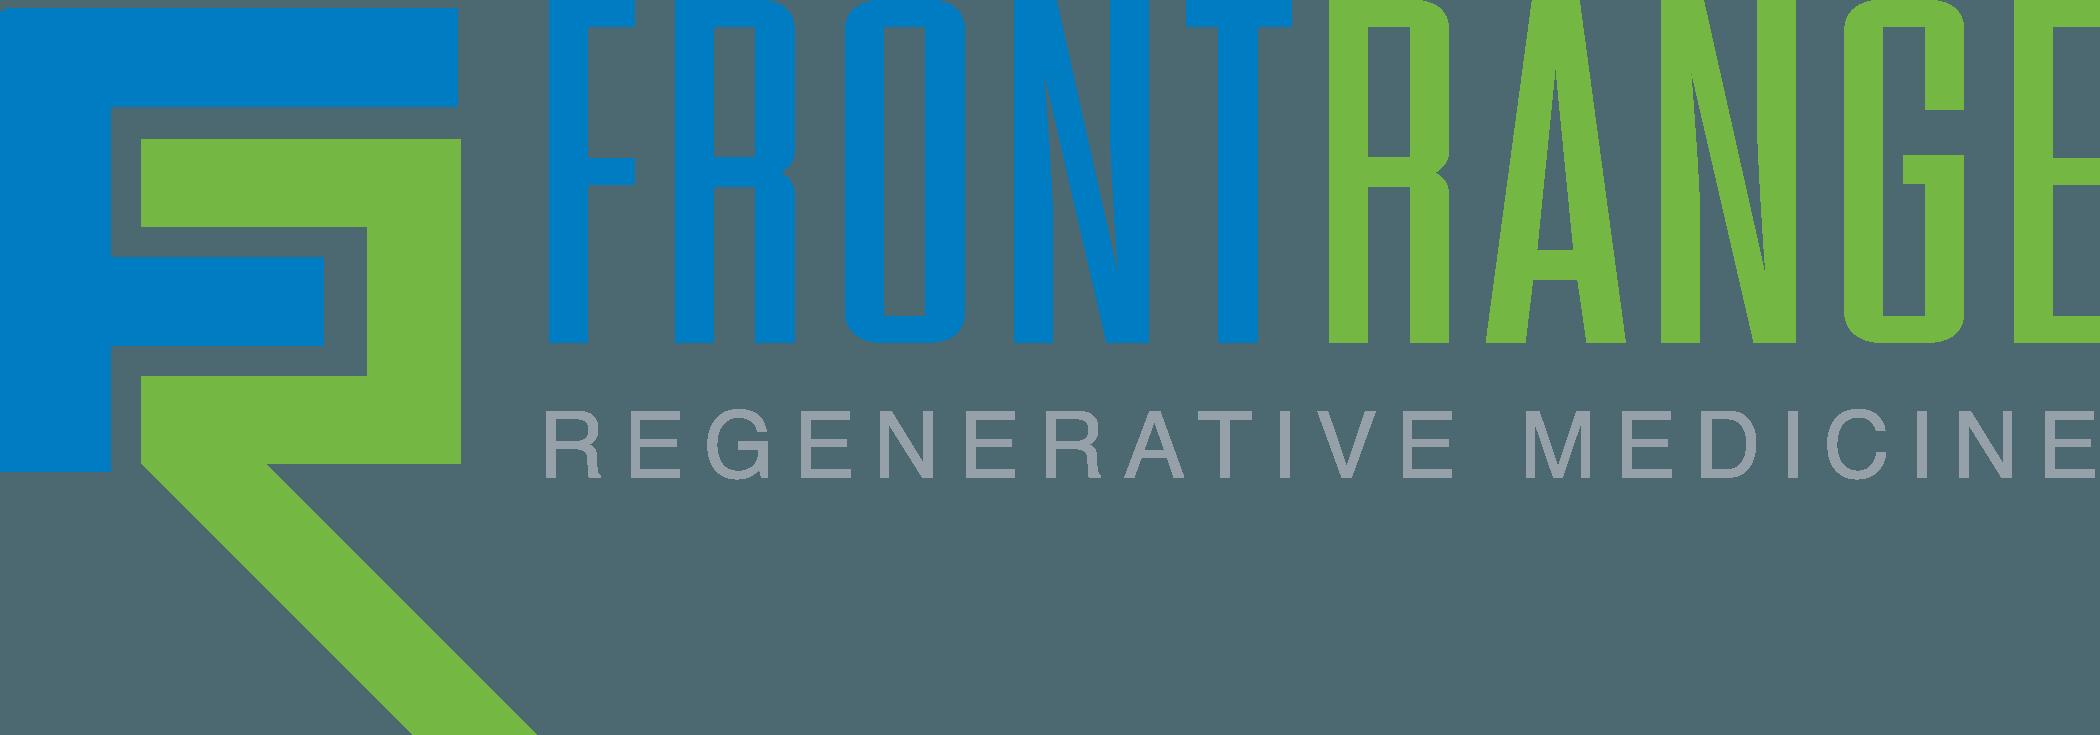 Front Range Regenerative Medicine